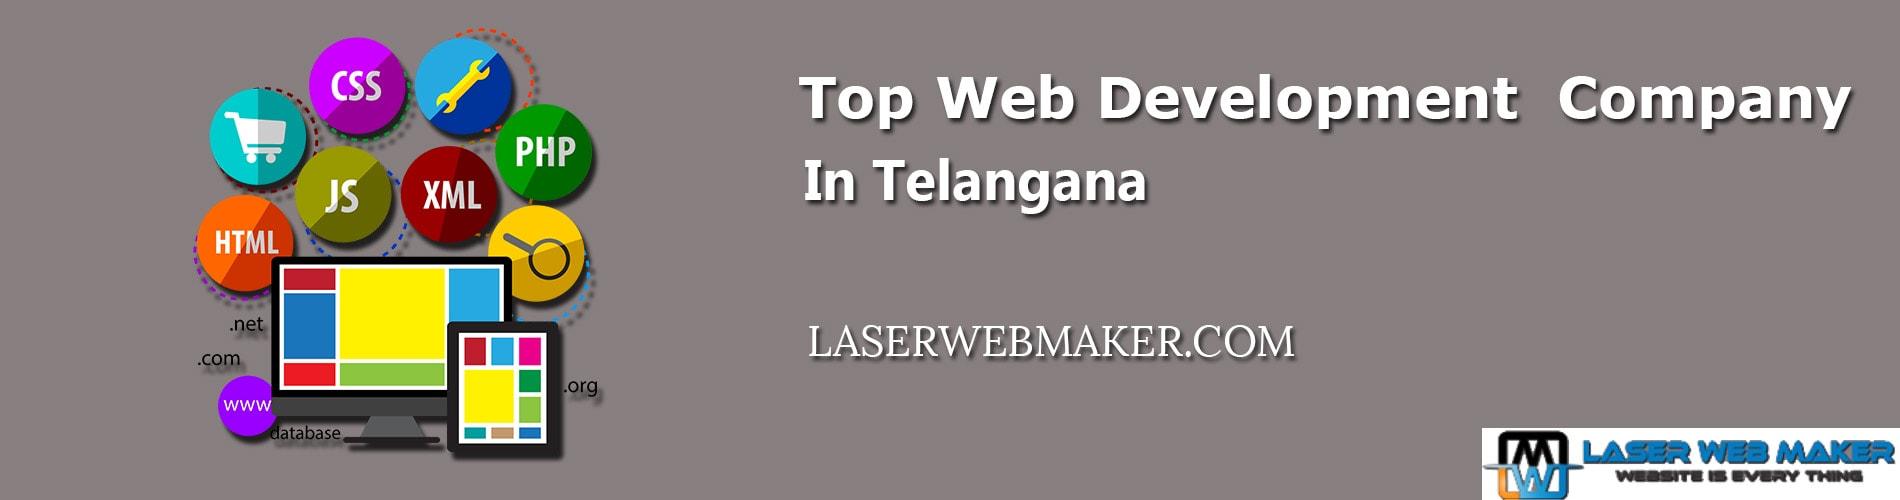 Top Web Development Company In Telangana